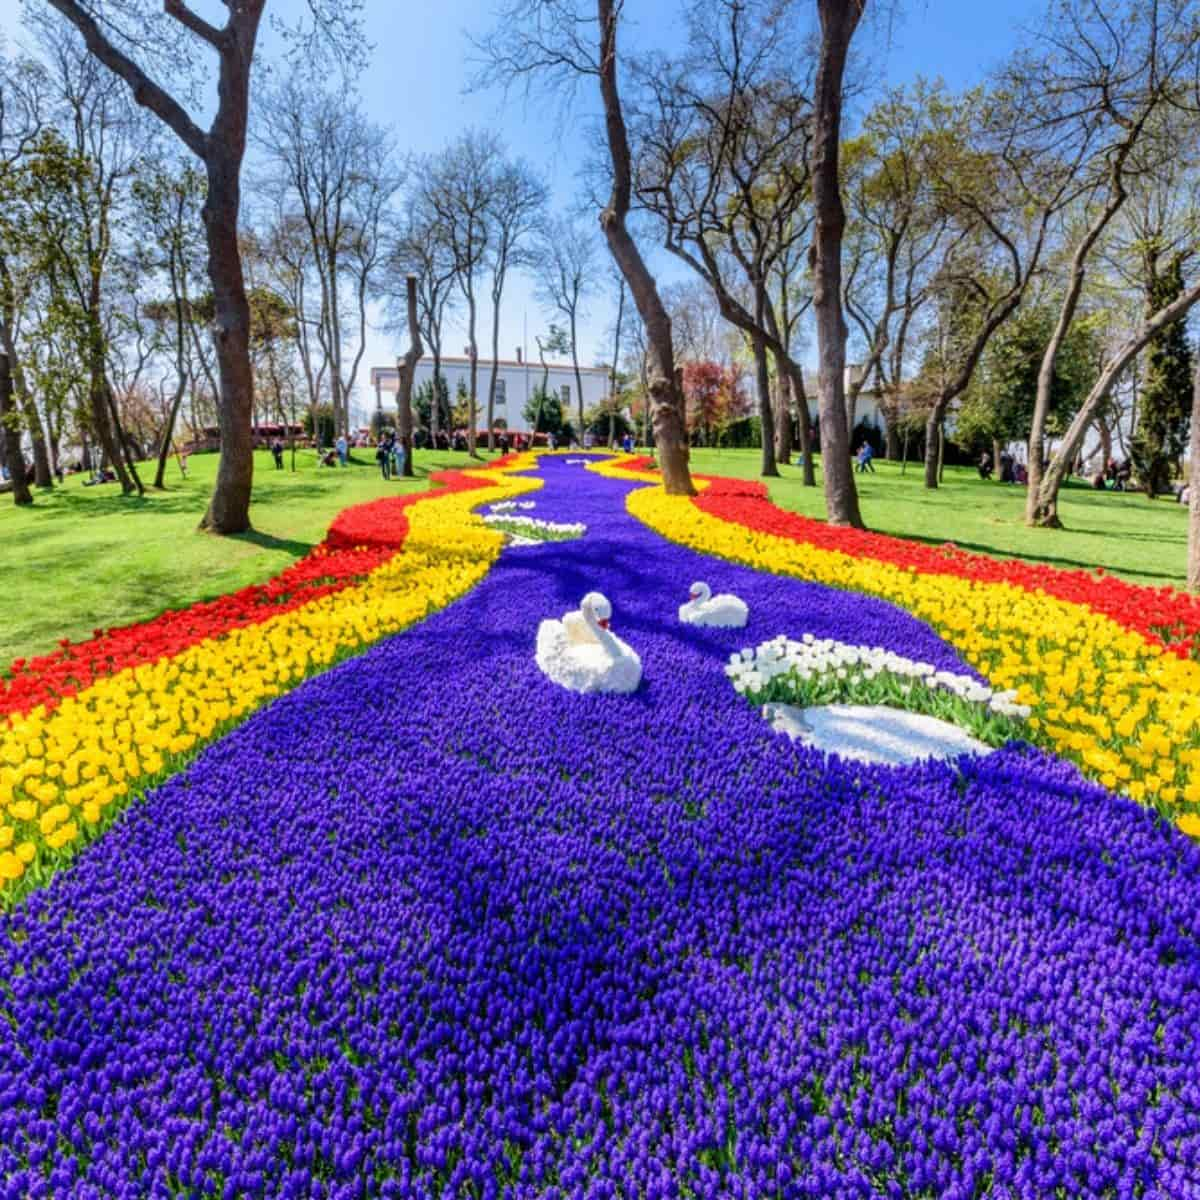 5 Tempat Terbaik Melihat Festival Taman Bunga Tulip di Turki - Emirgan Park